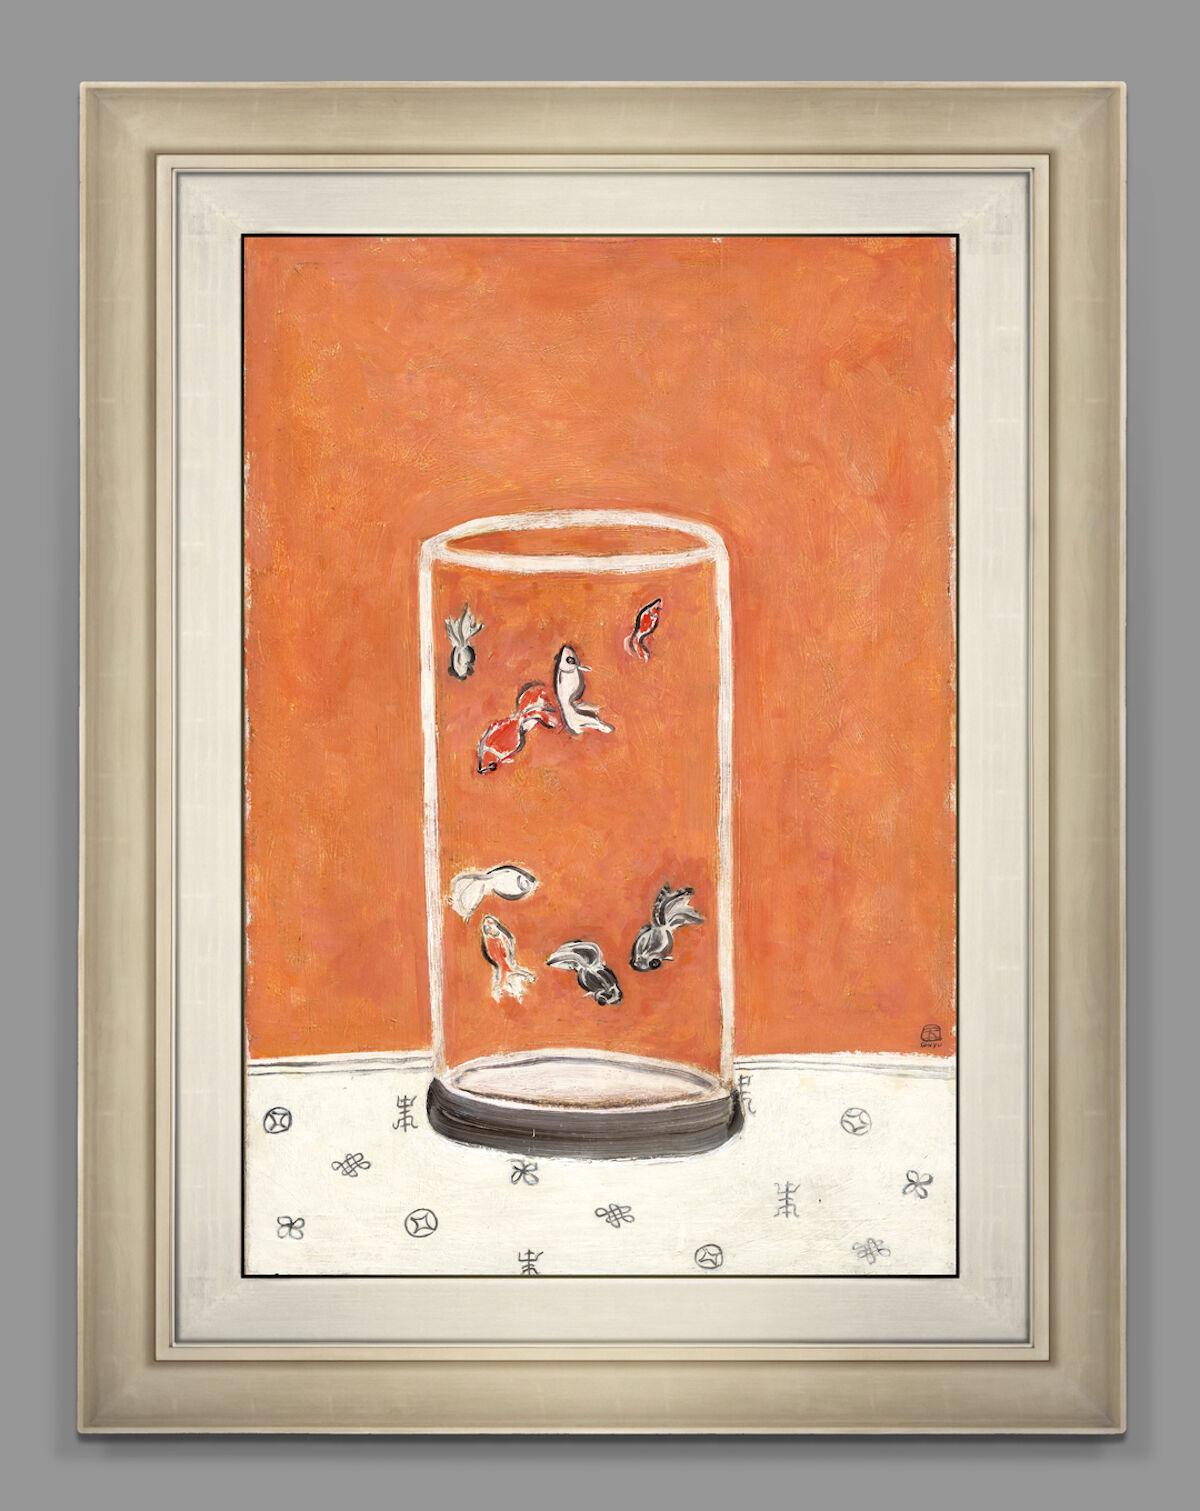 Sanyu, Goldfish, 1930s–1940s. Courtesy Christie's Images Ltd.